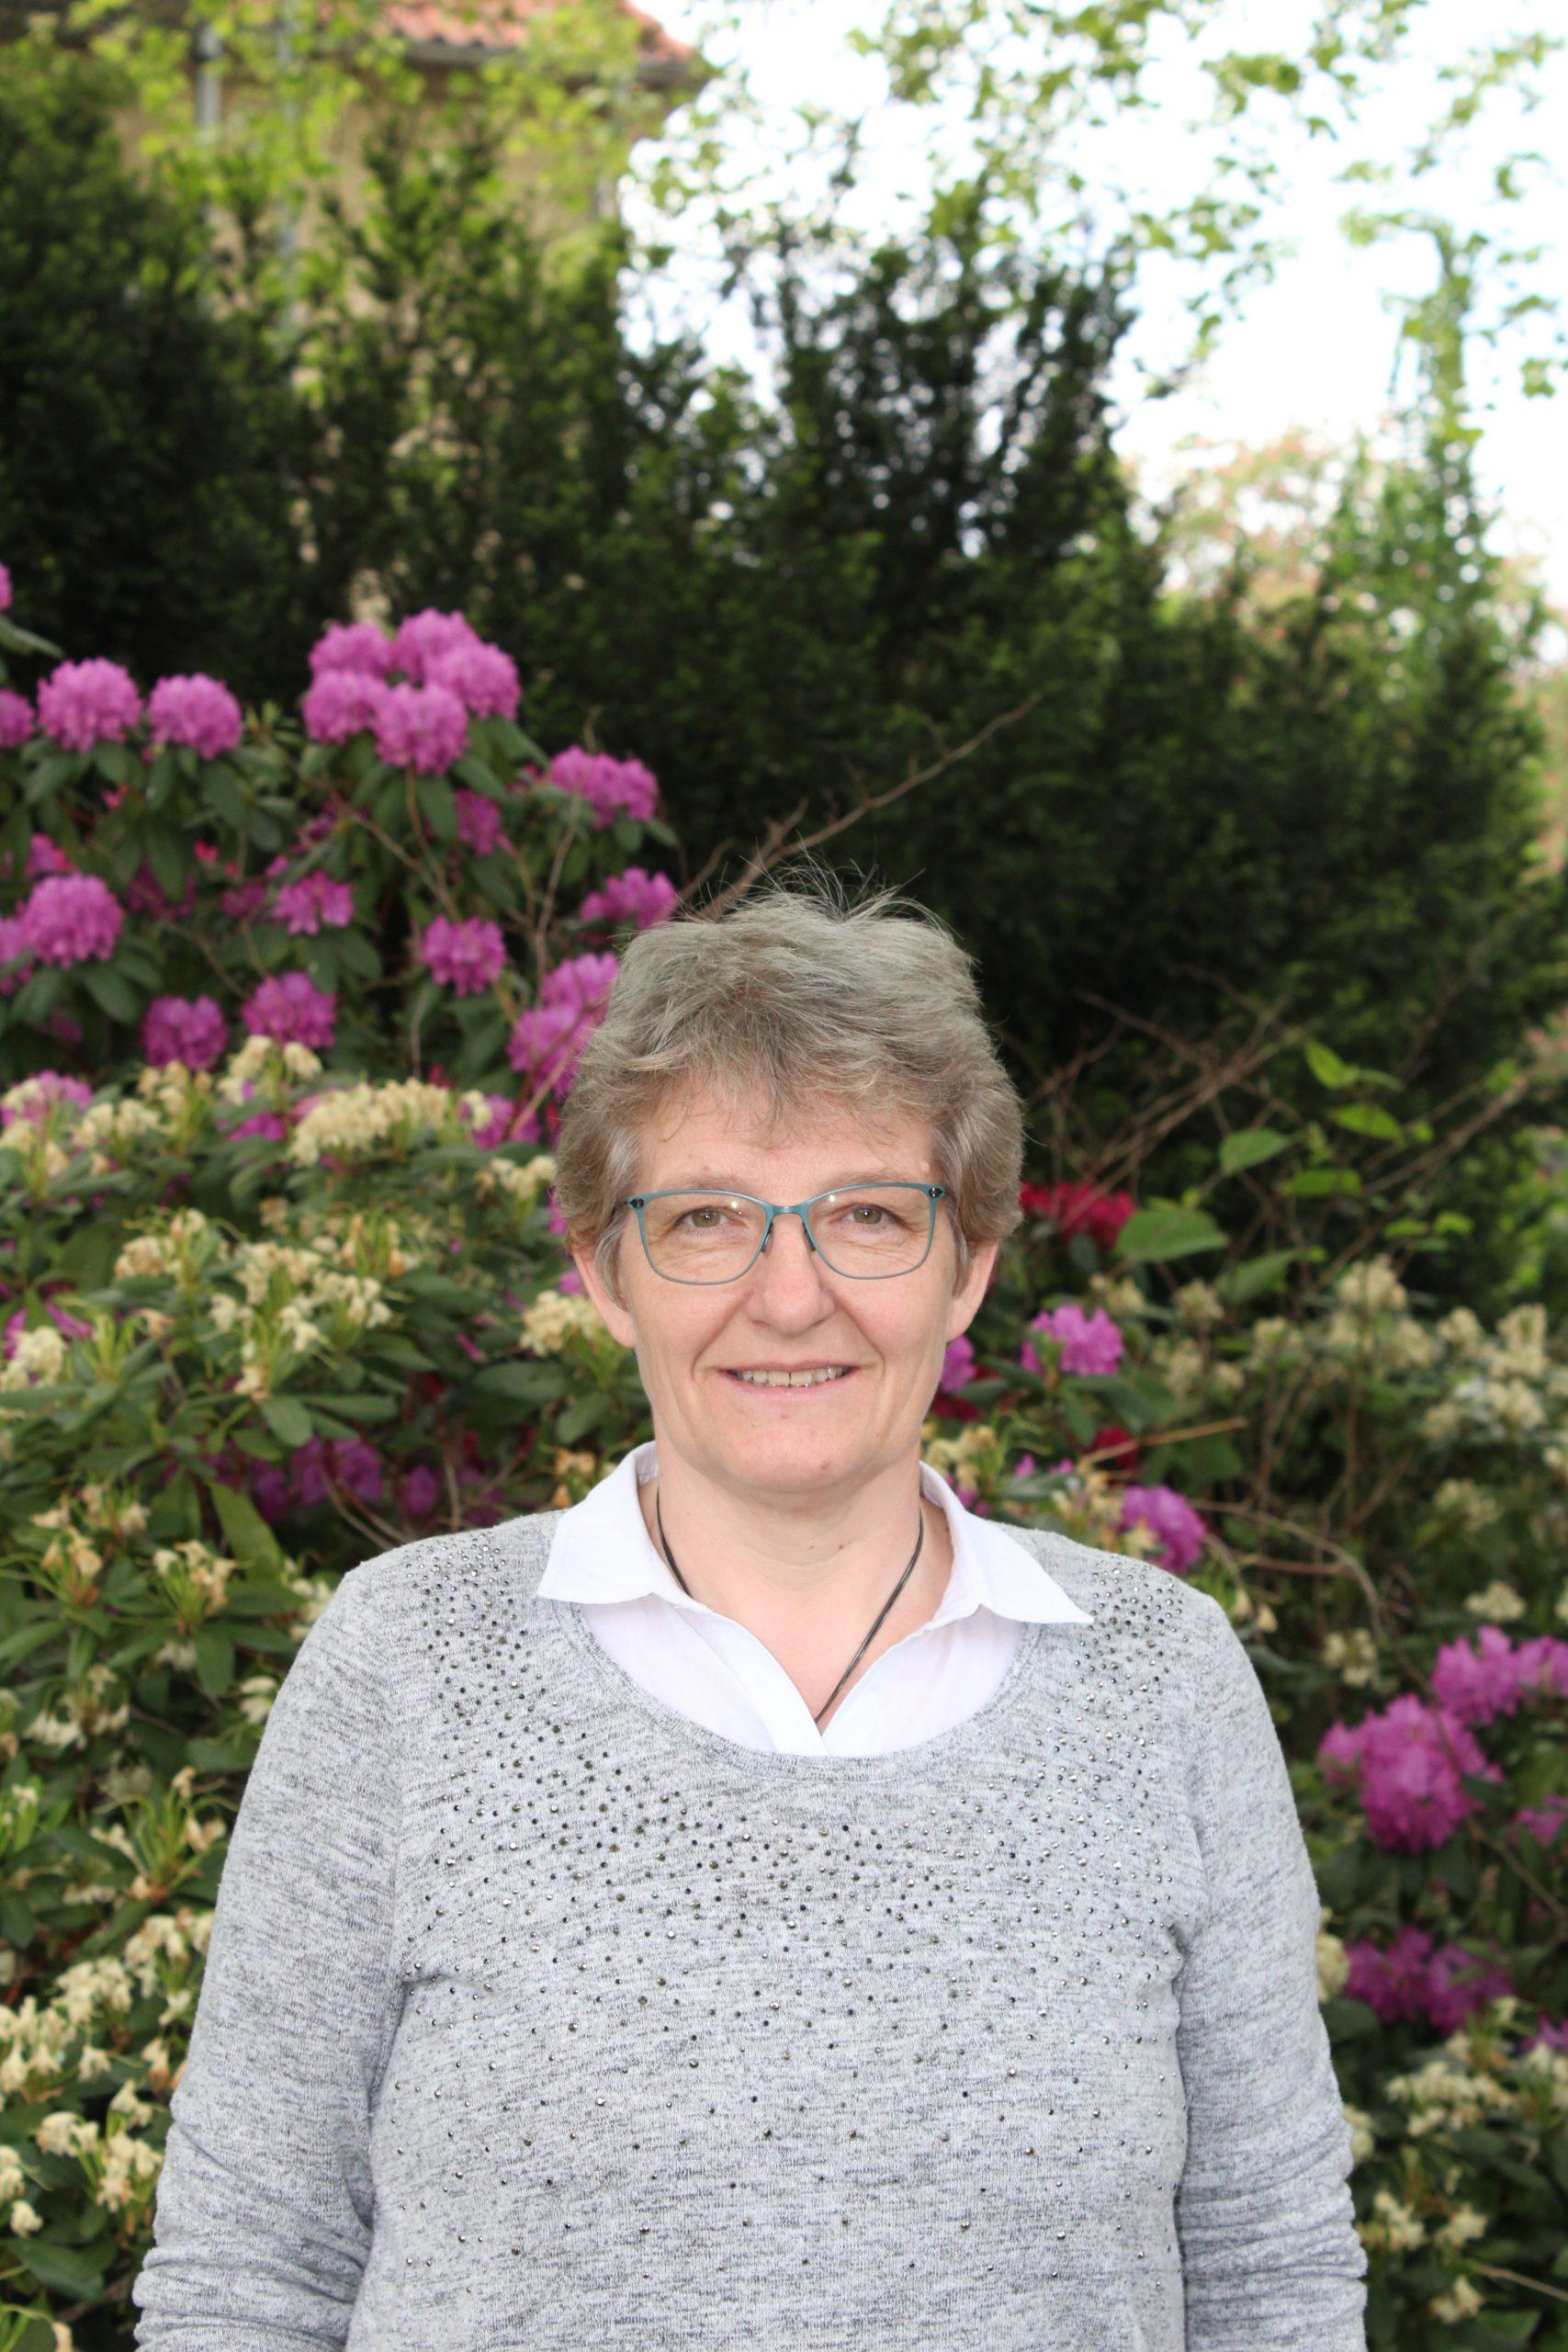 Maria Allerbeck